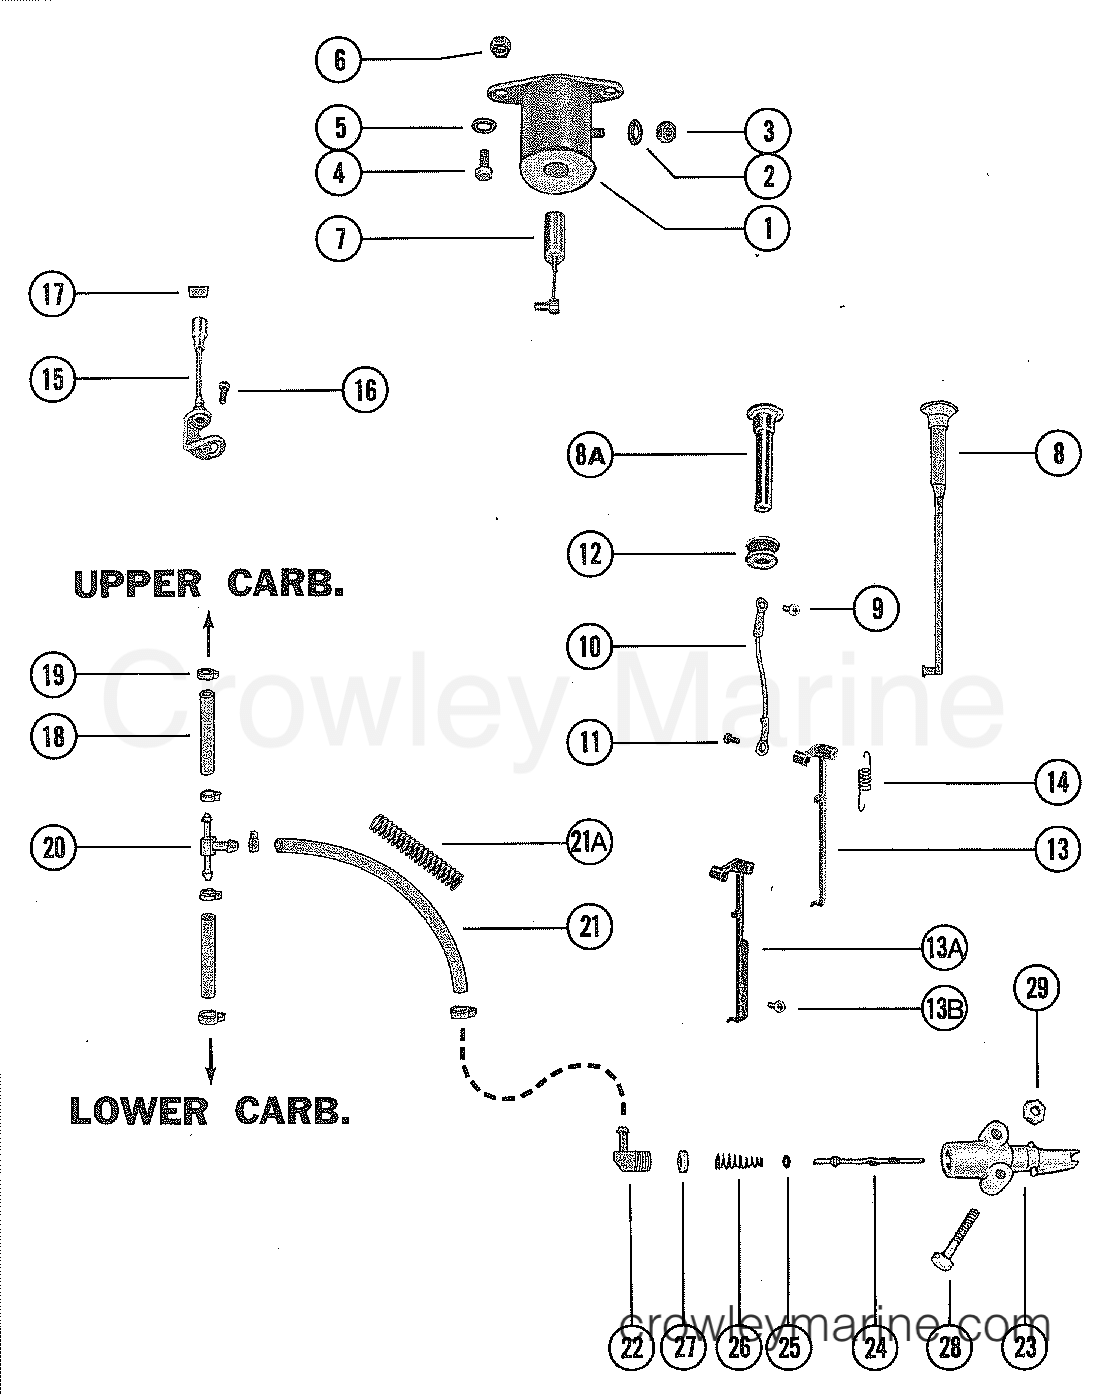 Yamaha Outboard Electric Choke Wiring Diagram Diagrams 250 Carburetor Linkage And Solenoid 1976 Mercury Gauge